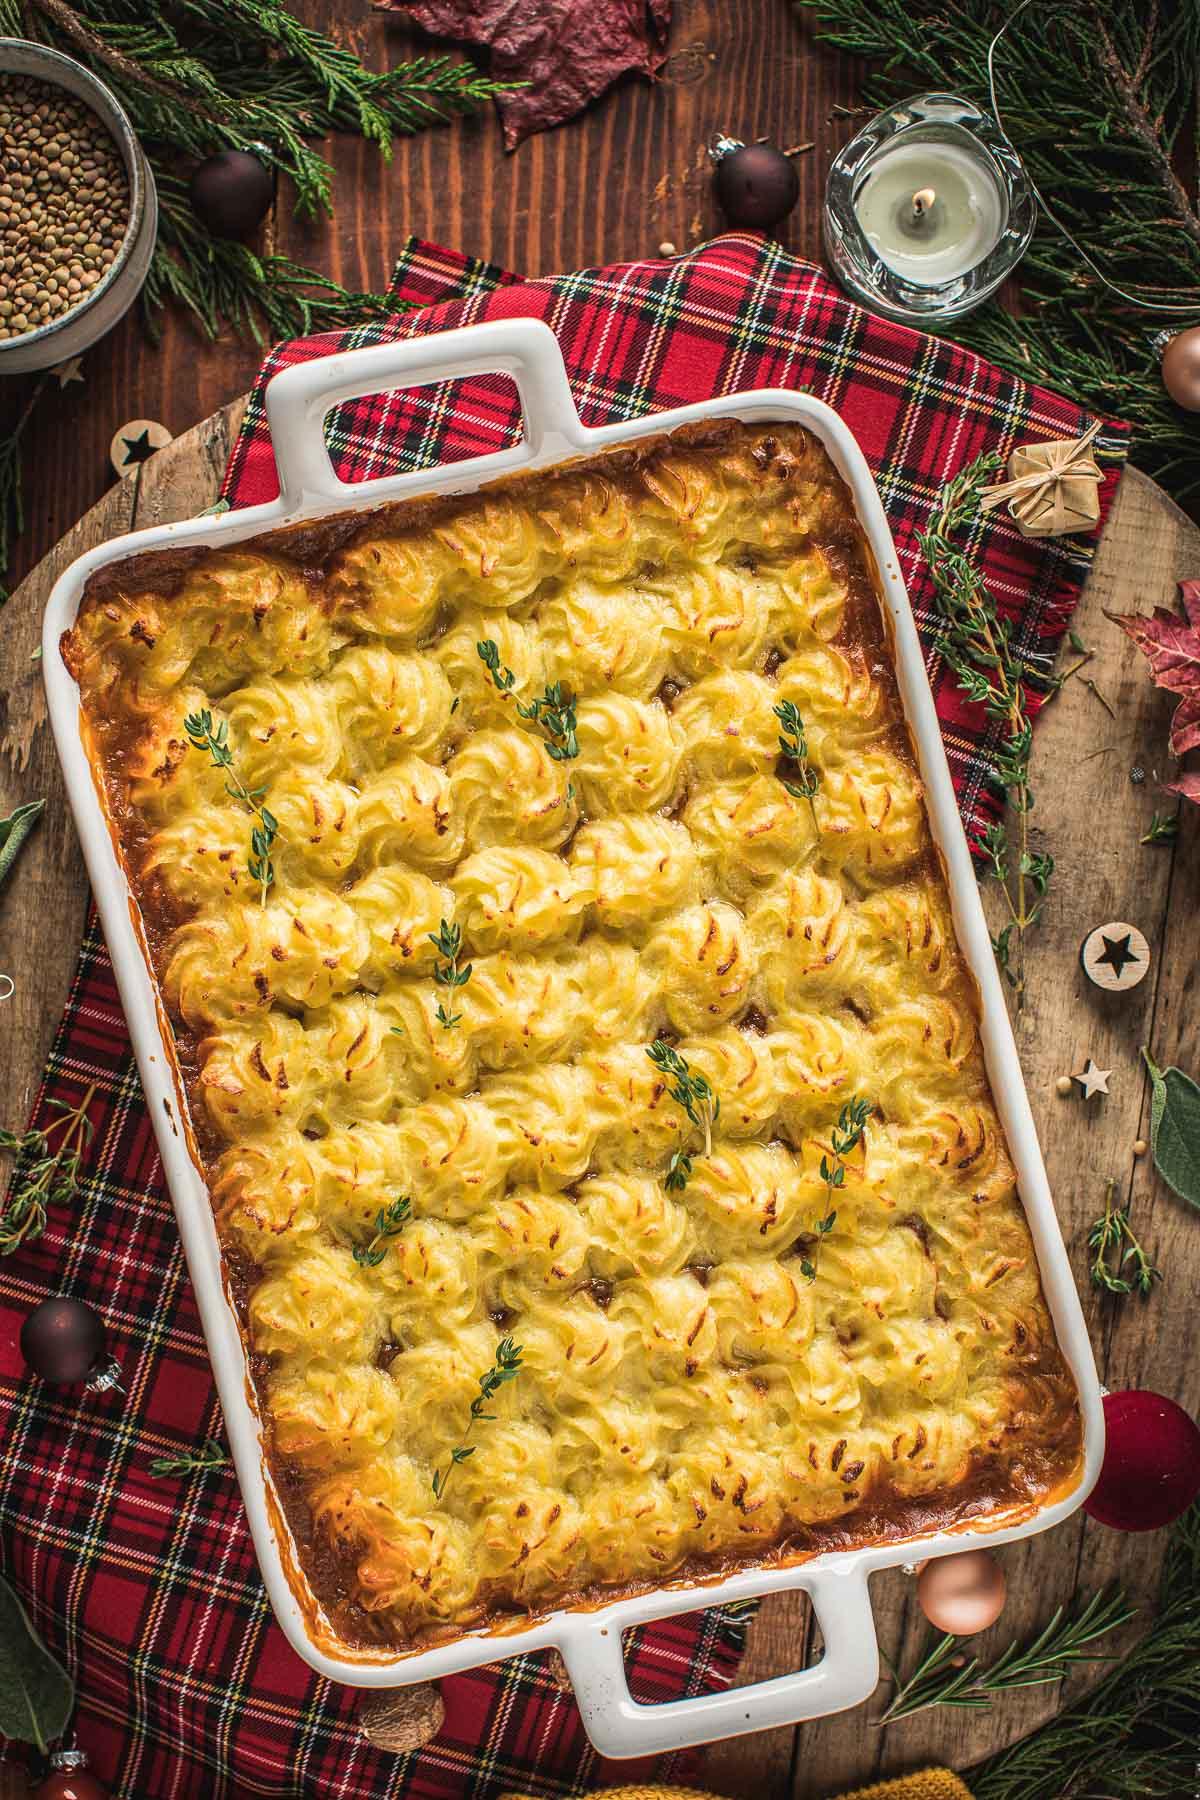 ricetta di Natale Vegan Shepherd's Pie di lenticchie con ragù di lenticchie funghi healthy Vegan Lentil Shepherd's Pie recipe cottage pie for Thanksgiving